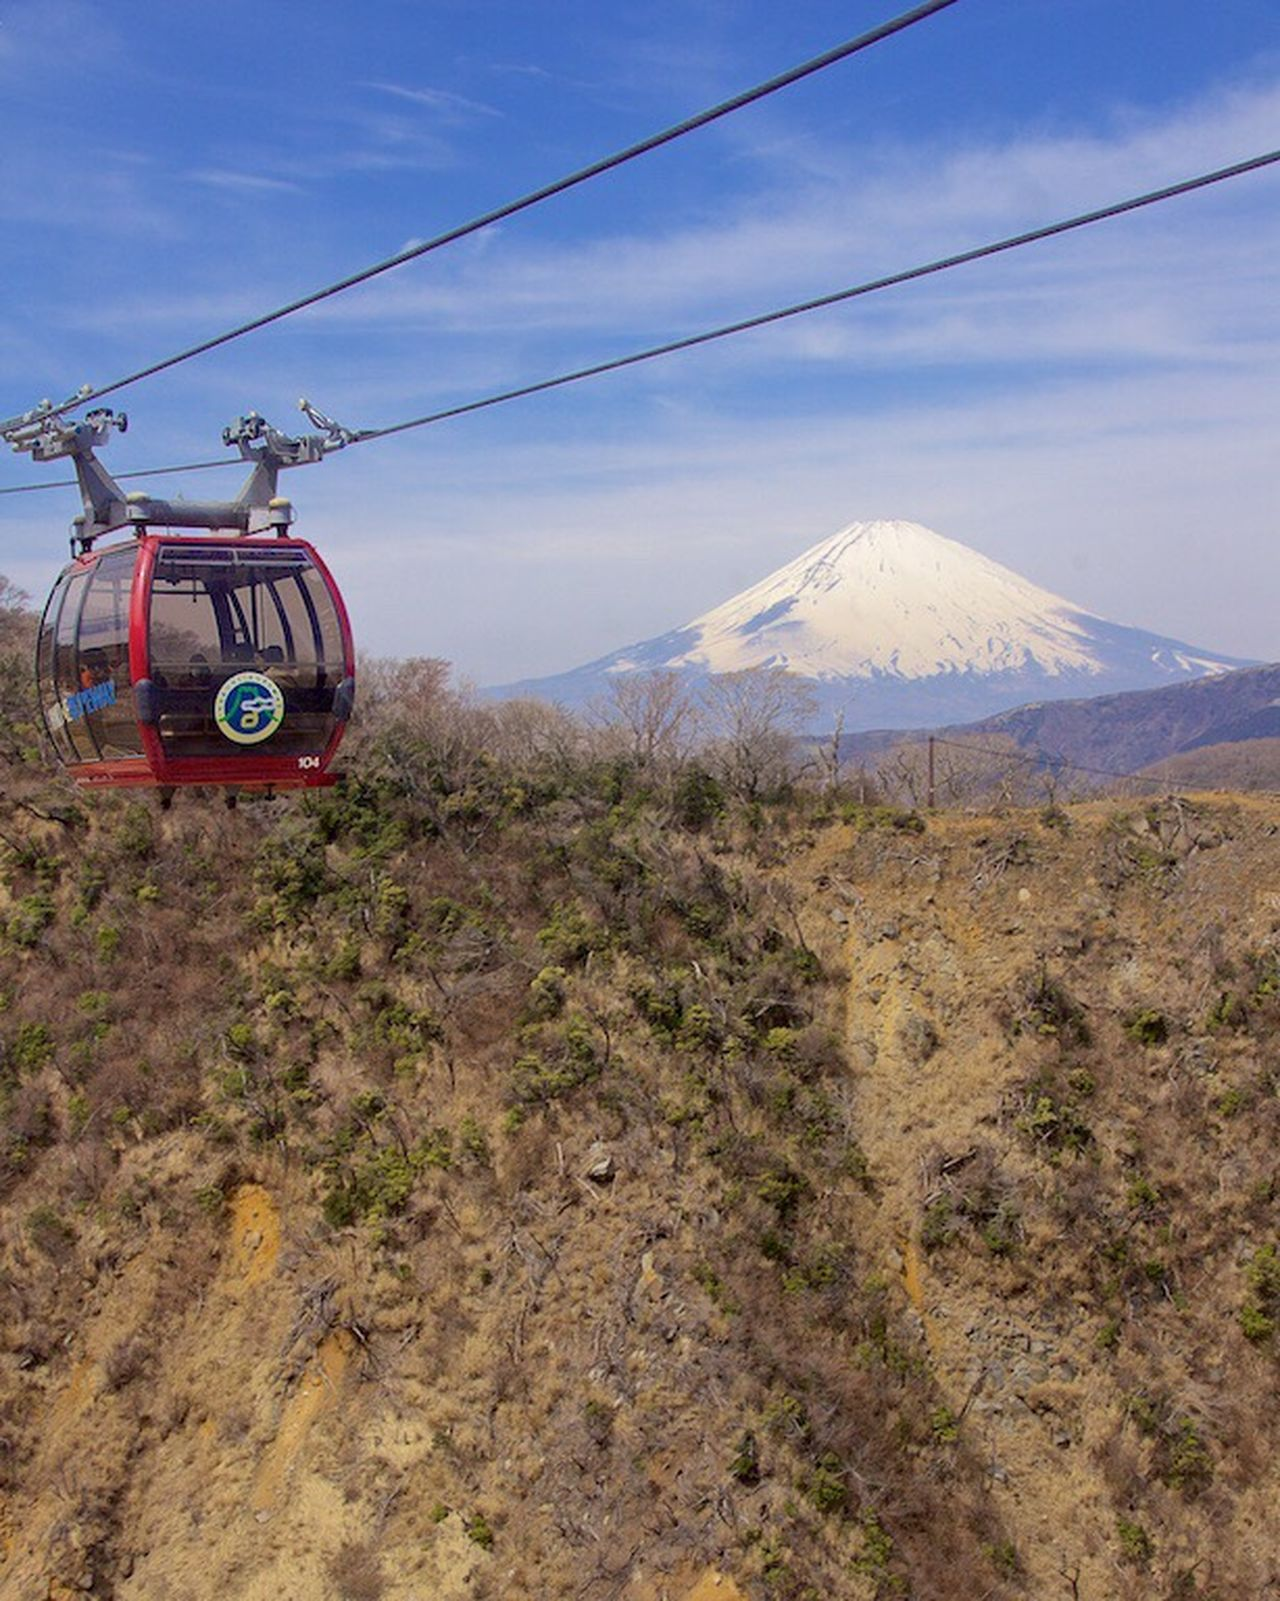 Hakone HAKONE!! Ropeway Skyway Cable Car Cablecar Cableway Lift Mt. Fuji Japan